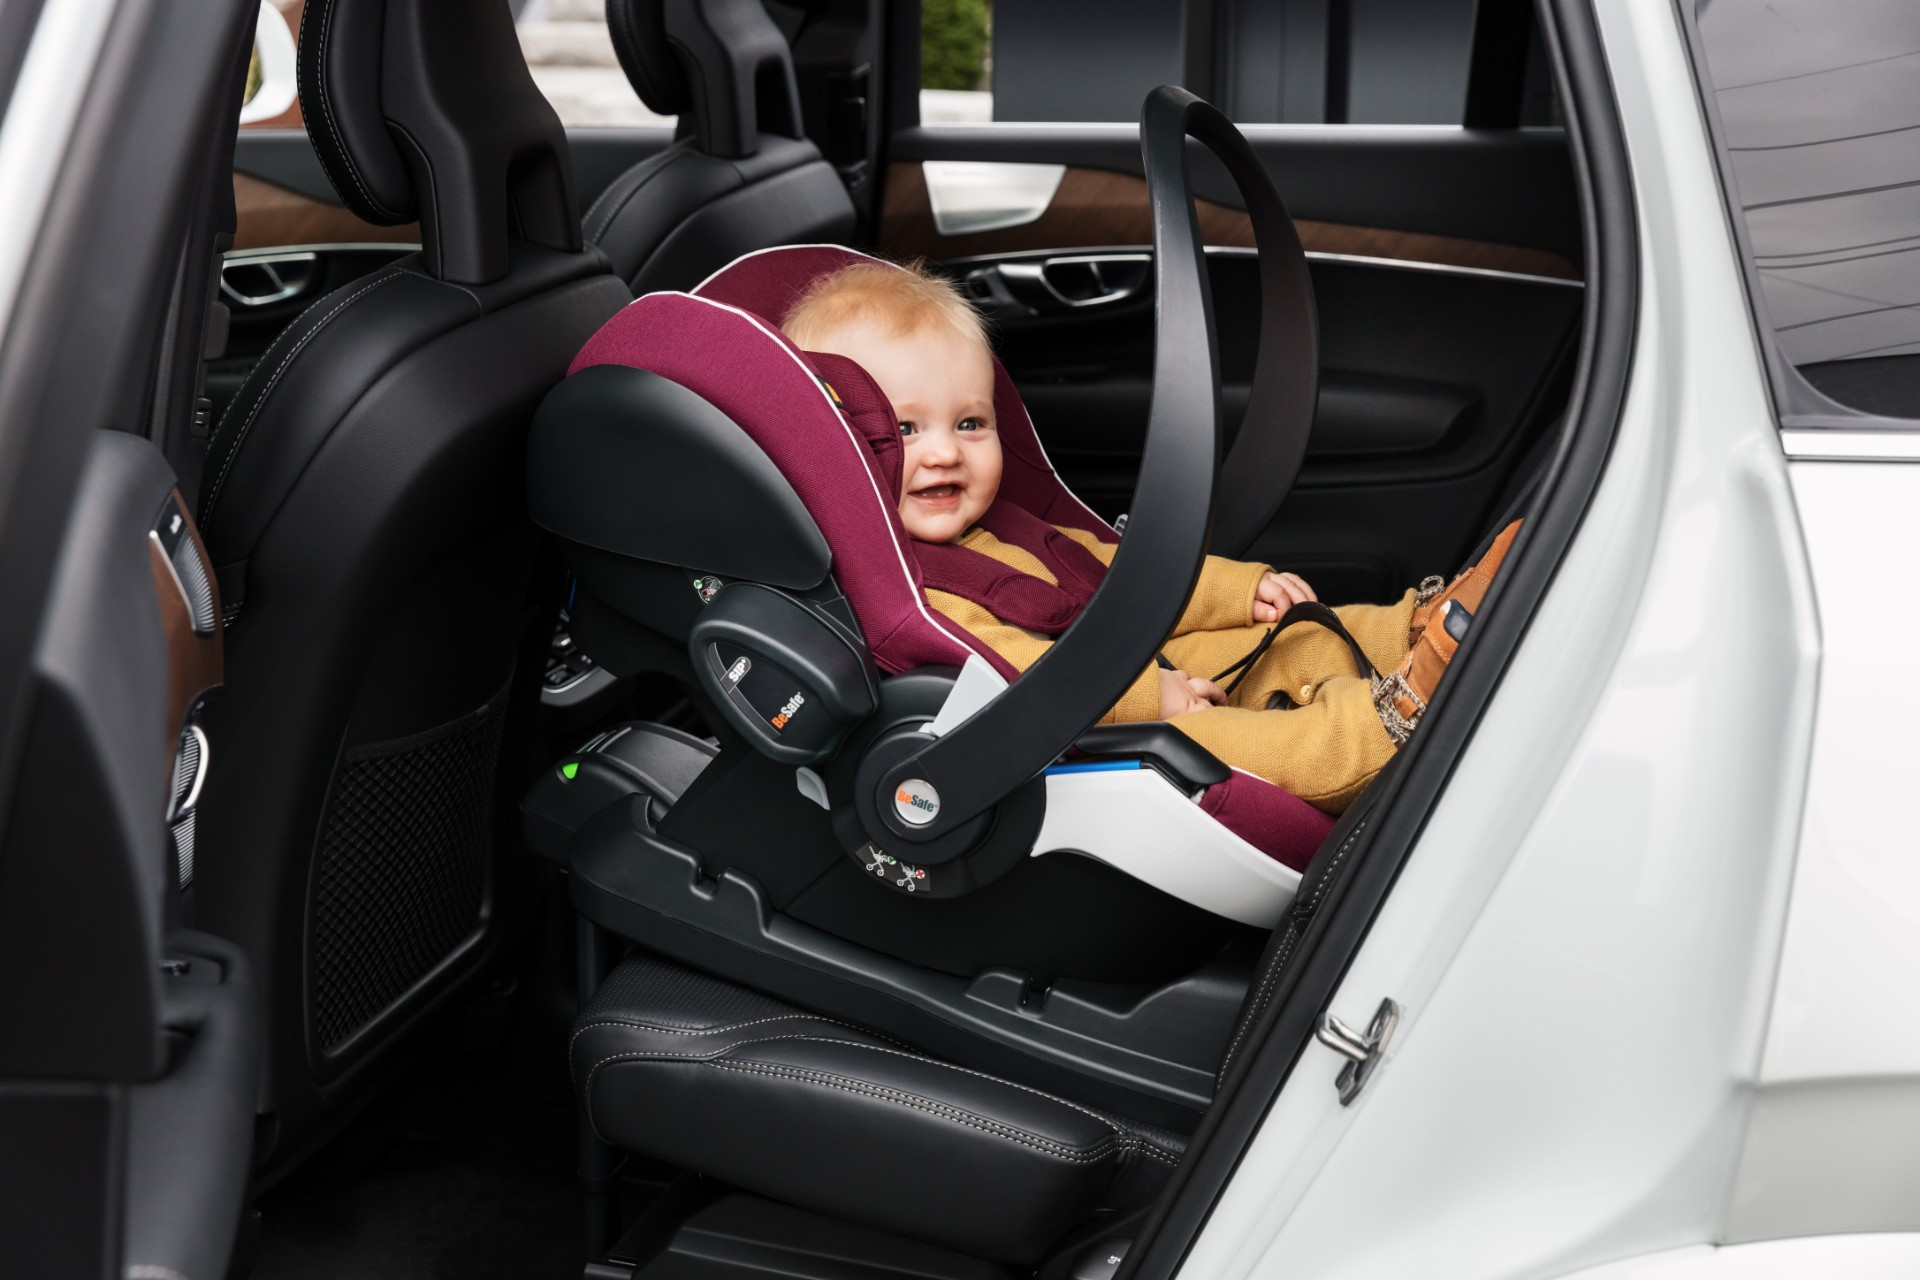 Cute baby in car seat